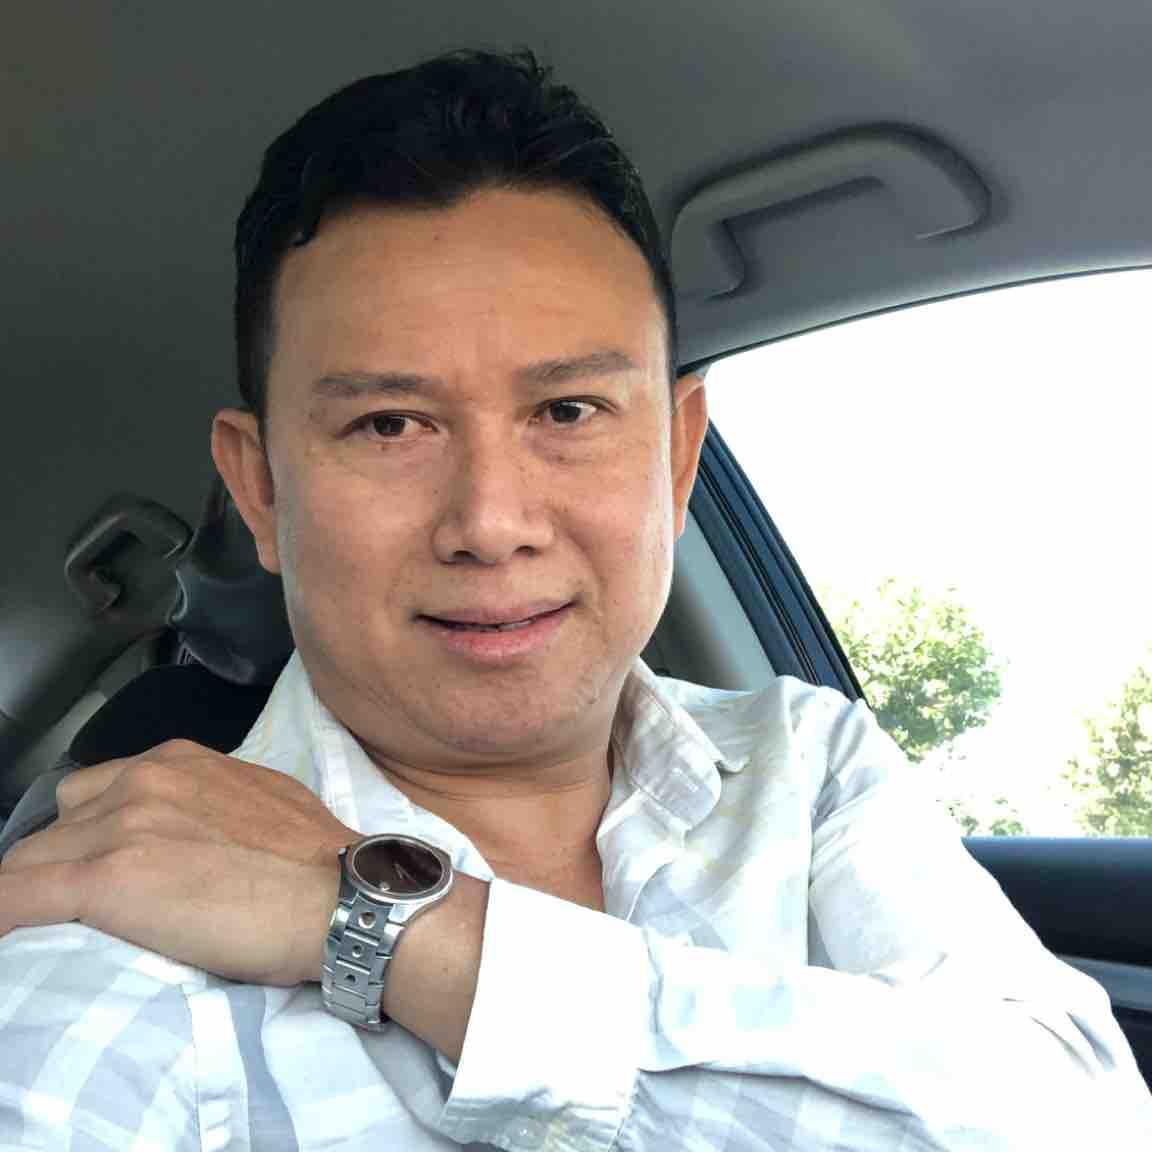 Richer Nguyen